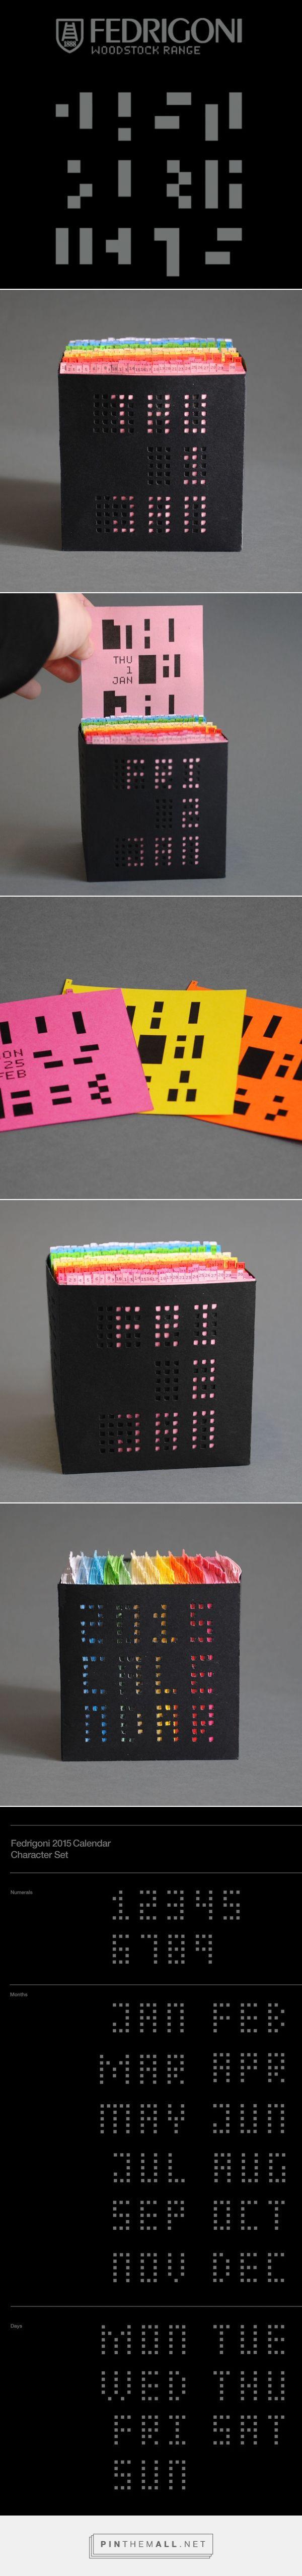 YCN Fedrigoni 2015 Calendar designed by Stuart Greer.